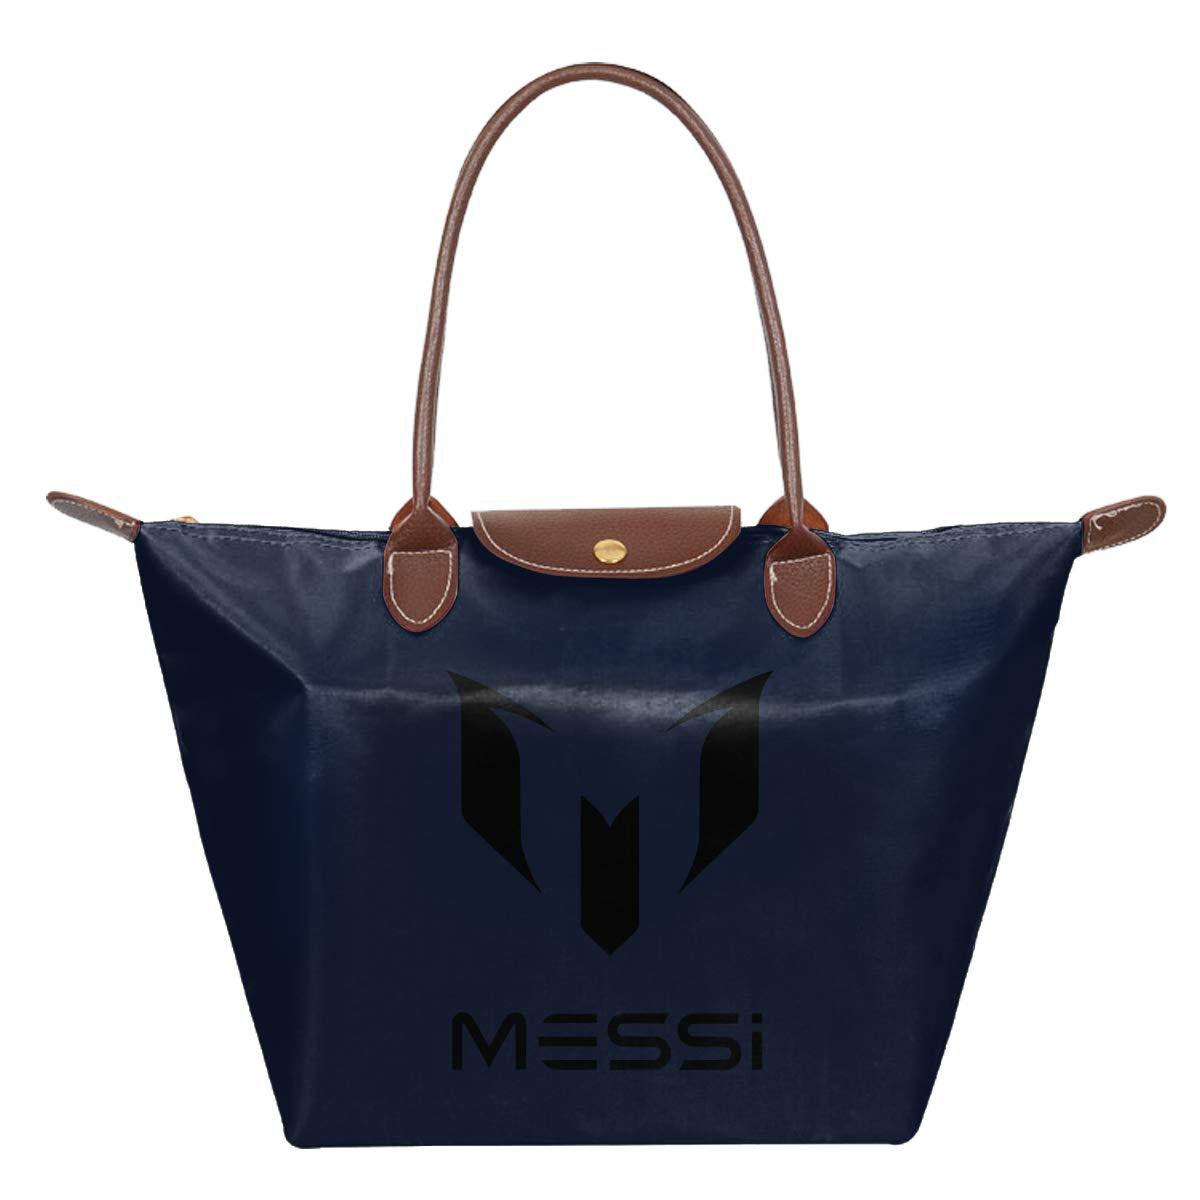 Messi Waterproof Leather Folded Messenger Nylon Bag Travel Tote Hopping Folding School Handbags